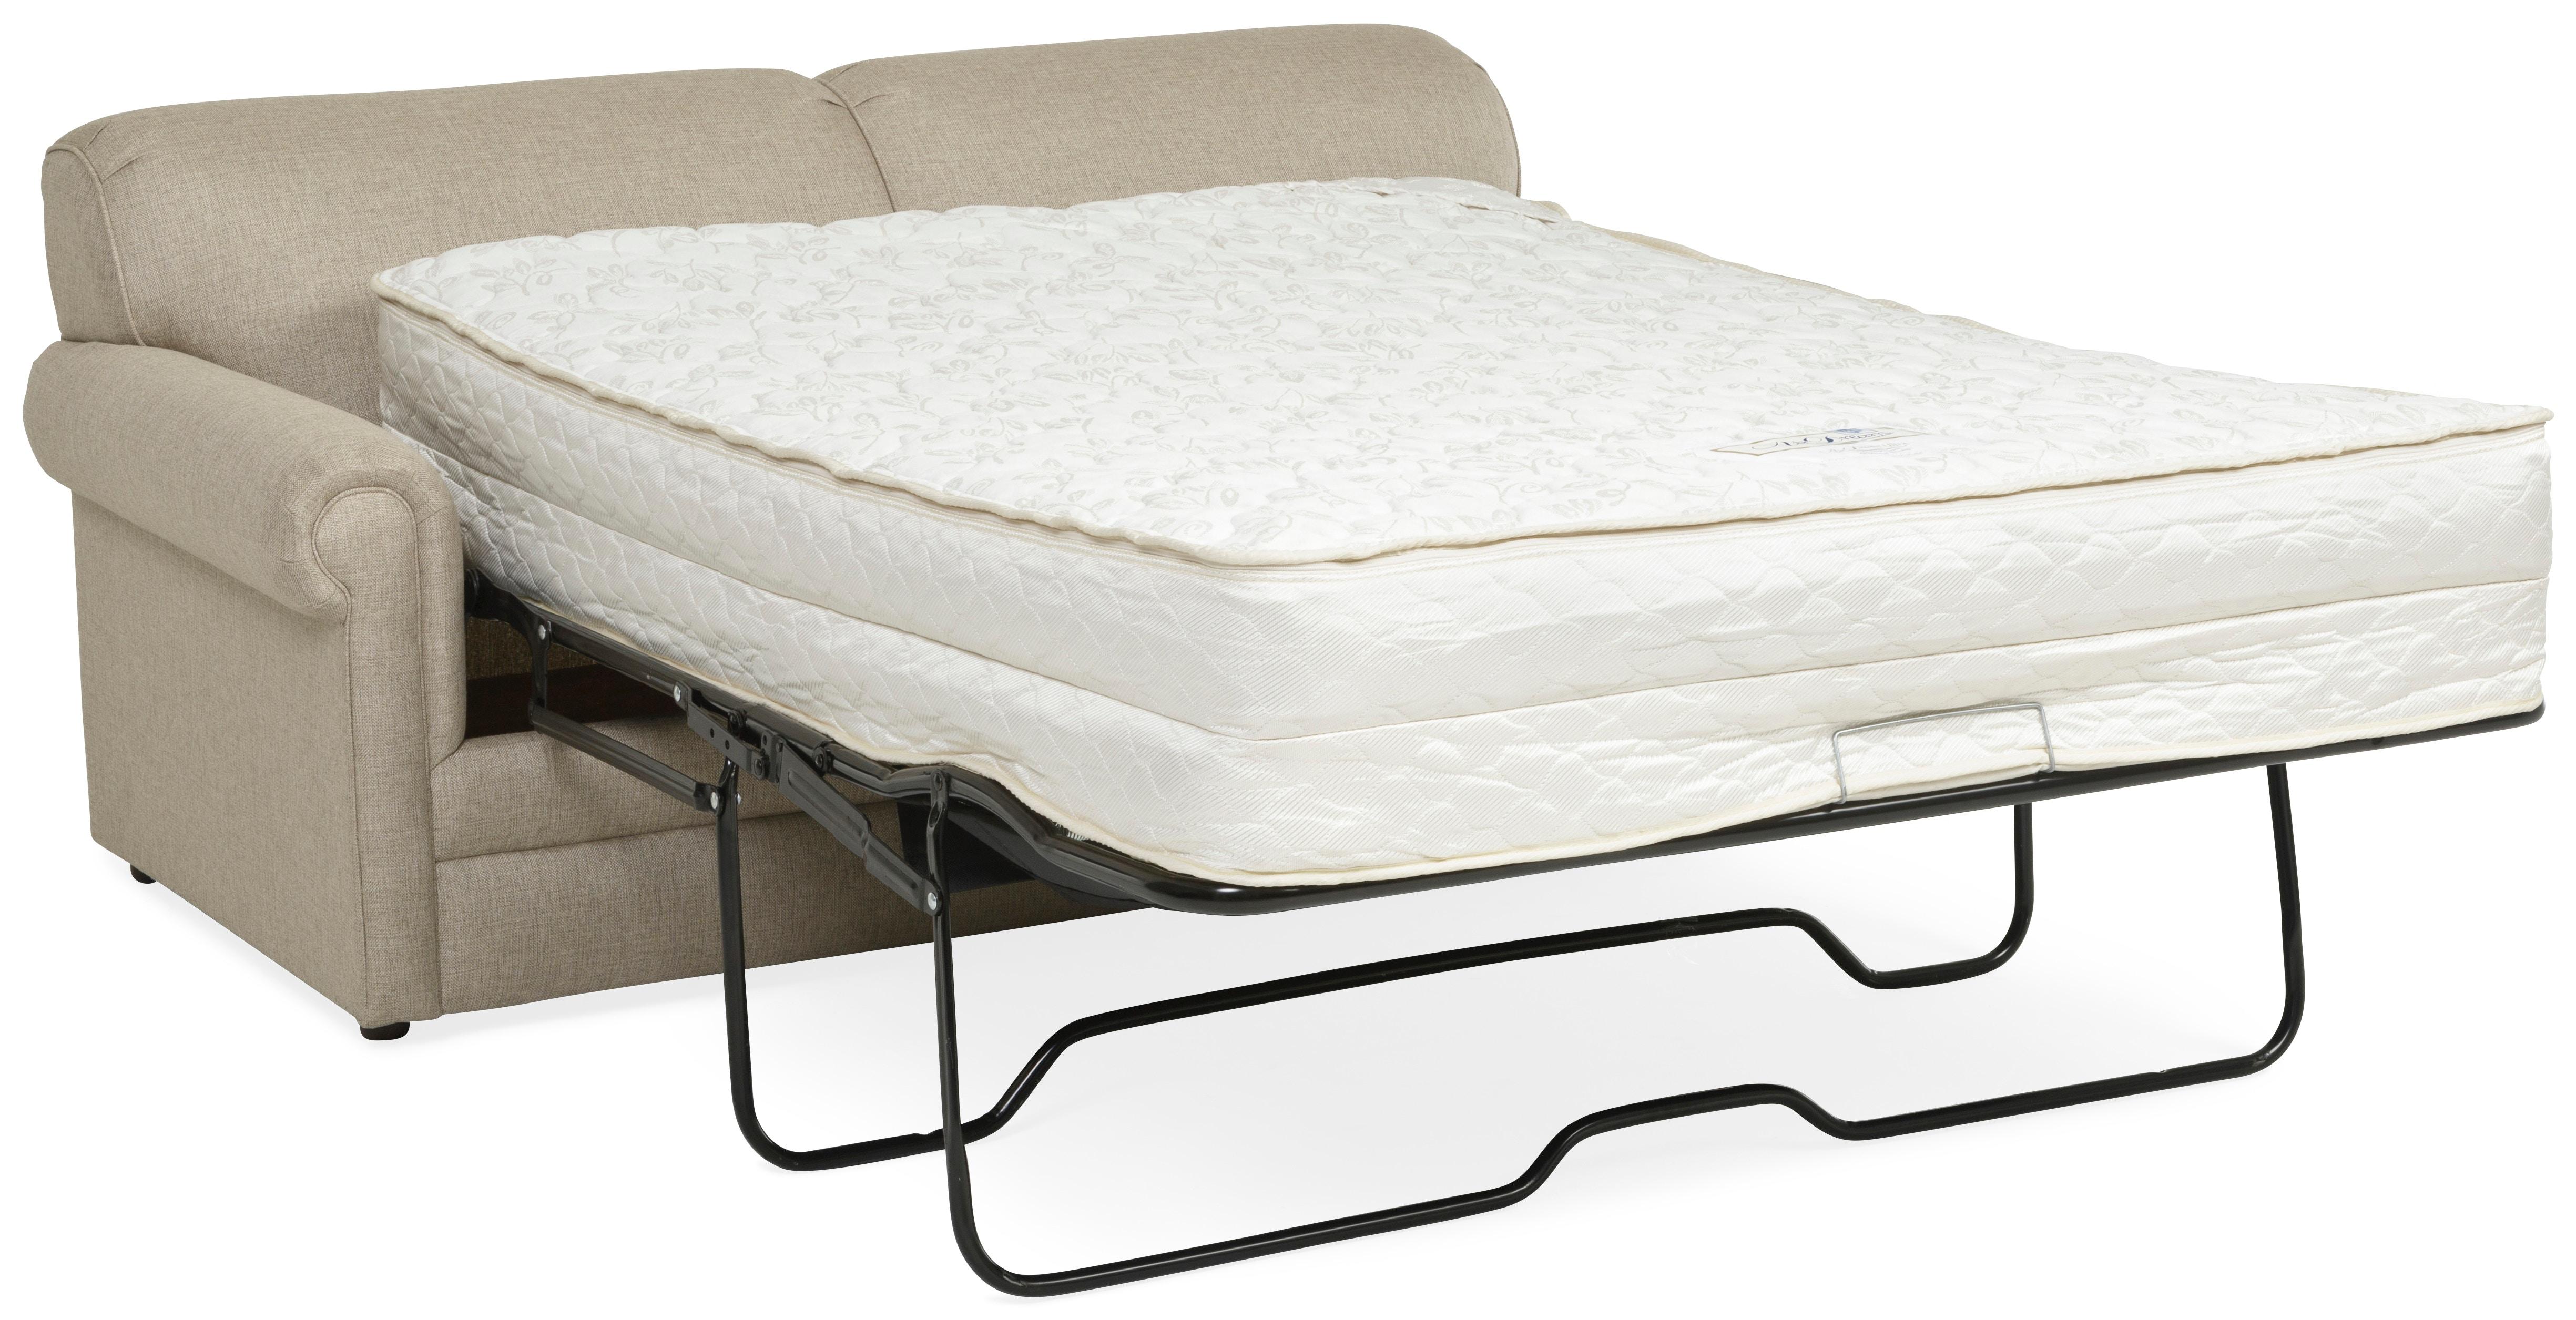 Kerry Full Air Mattress Sleeper Sofa   LACE ST:507383